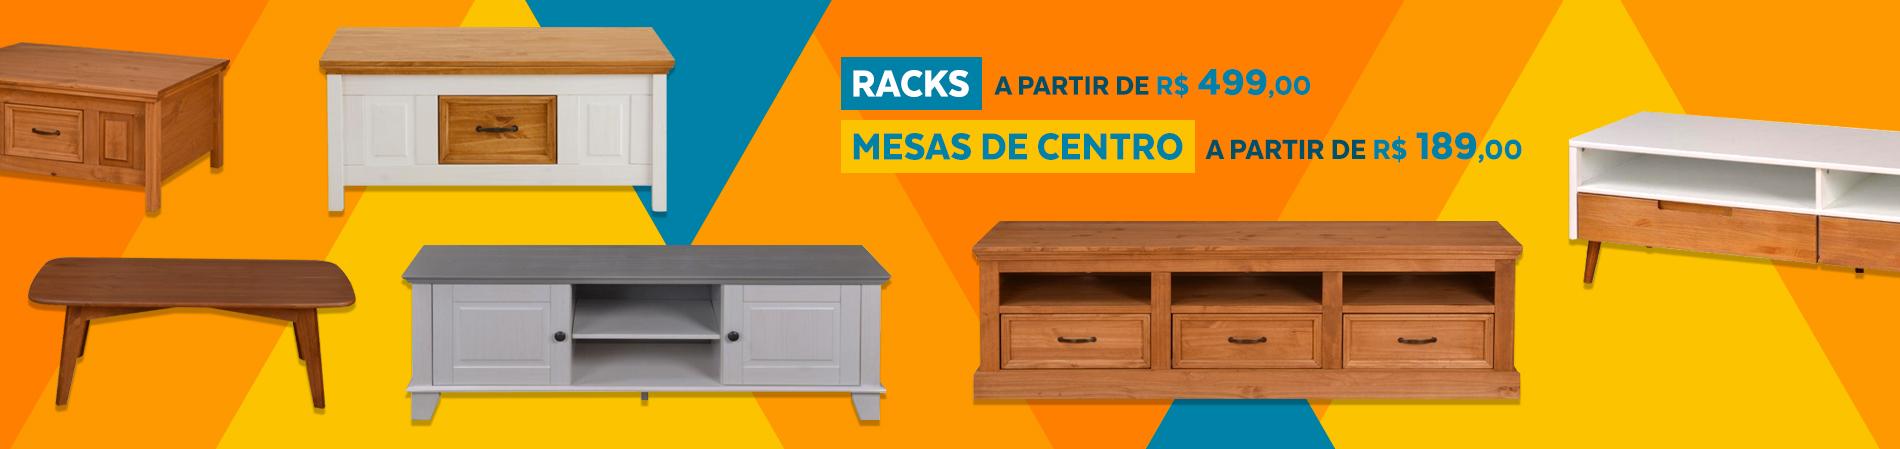 Racks e Mesas de Centro